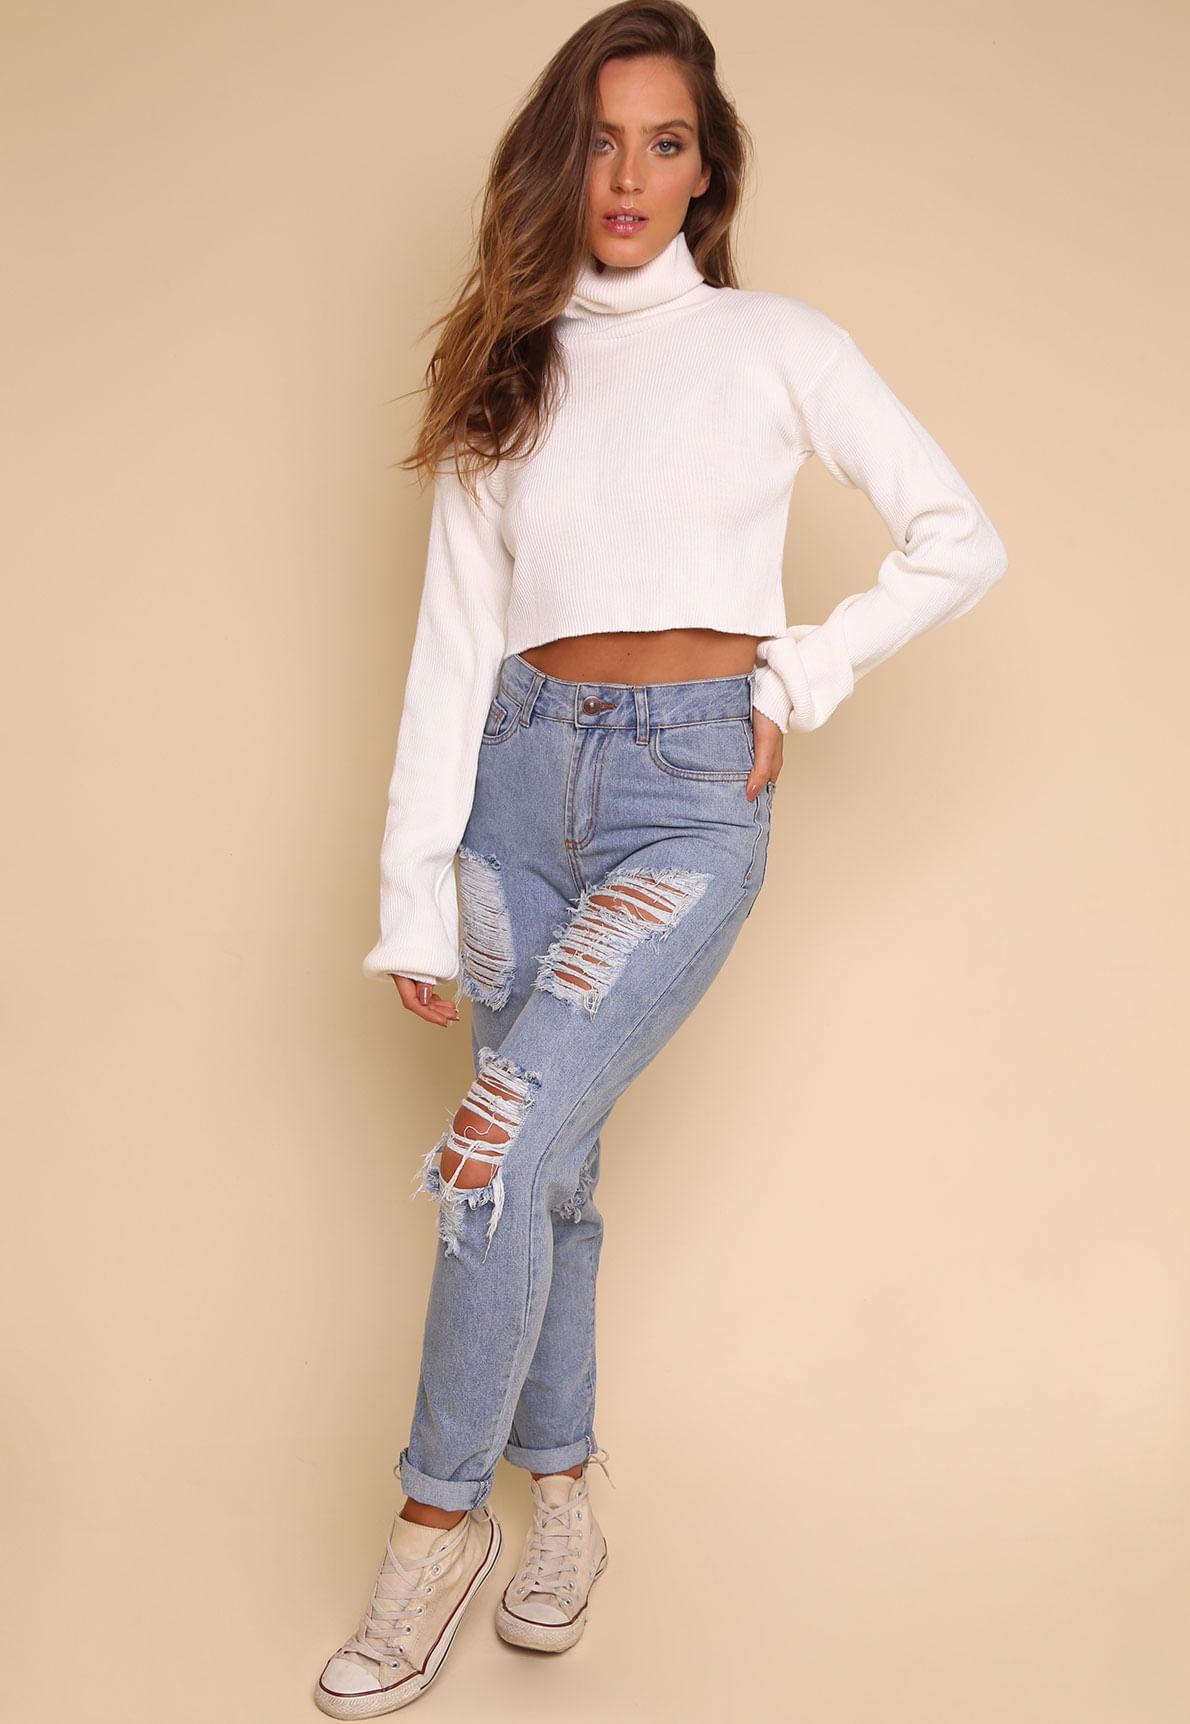 25668-calca-baggy-jeans-destroyed-melissa-mundo-lolita-08